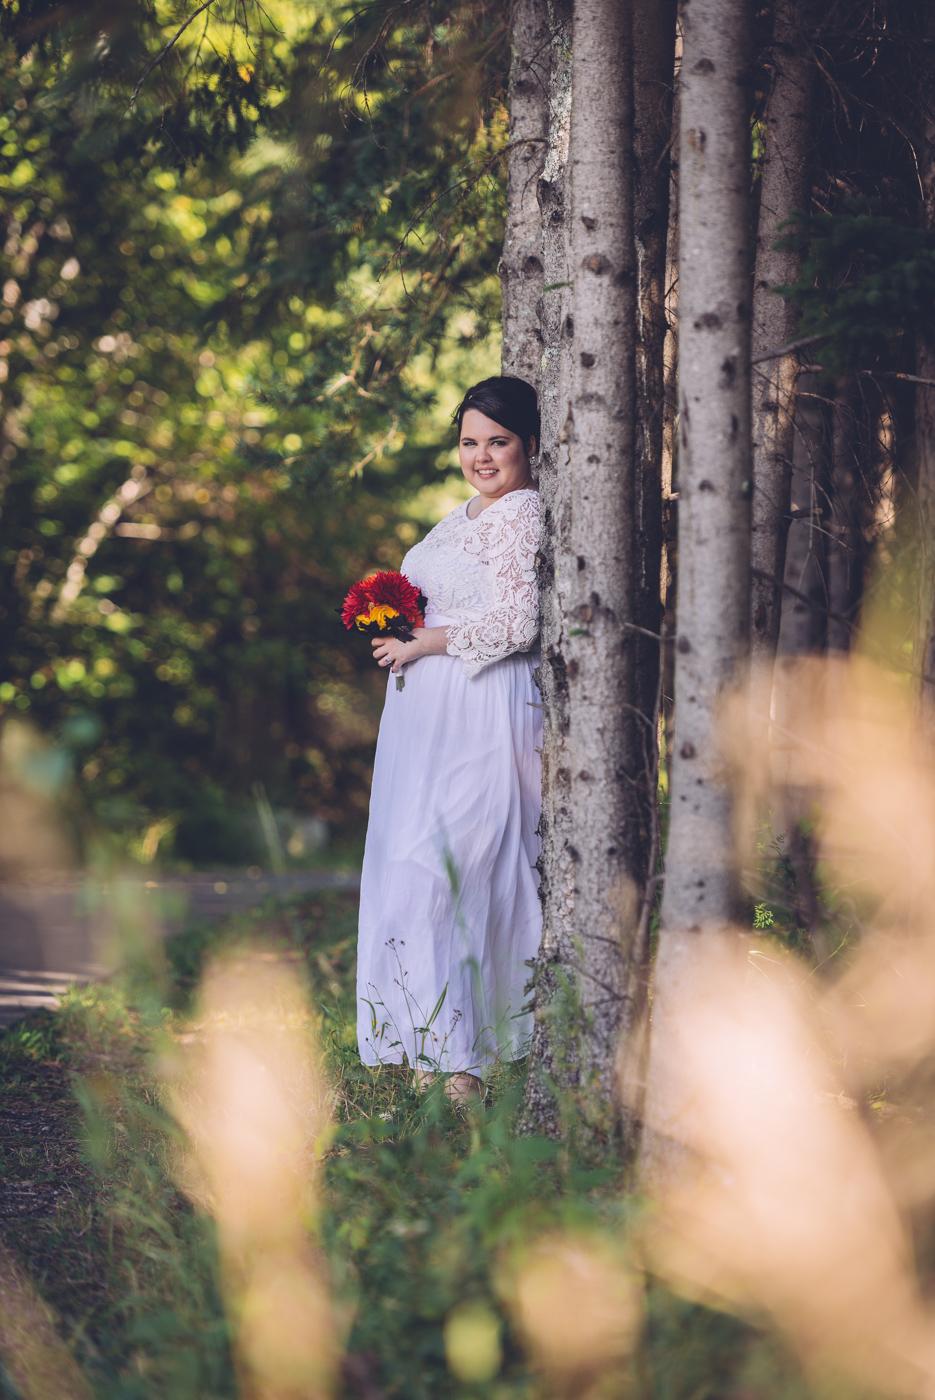 adam_eden_wedding_blog46.jpg